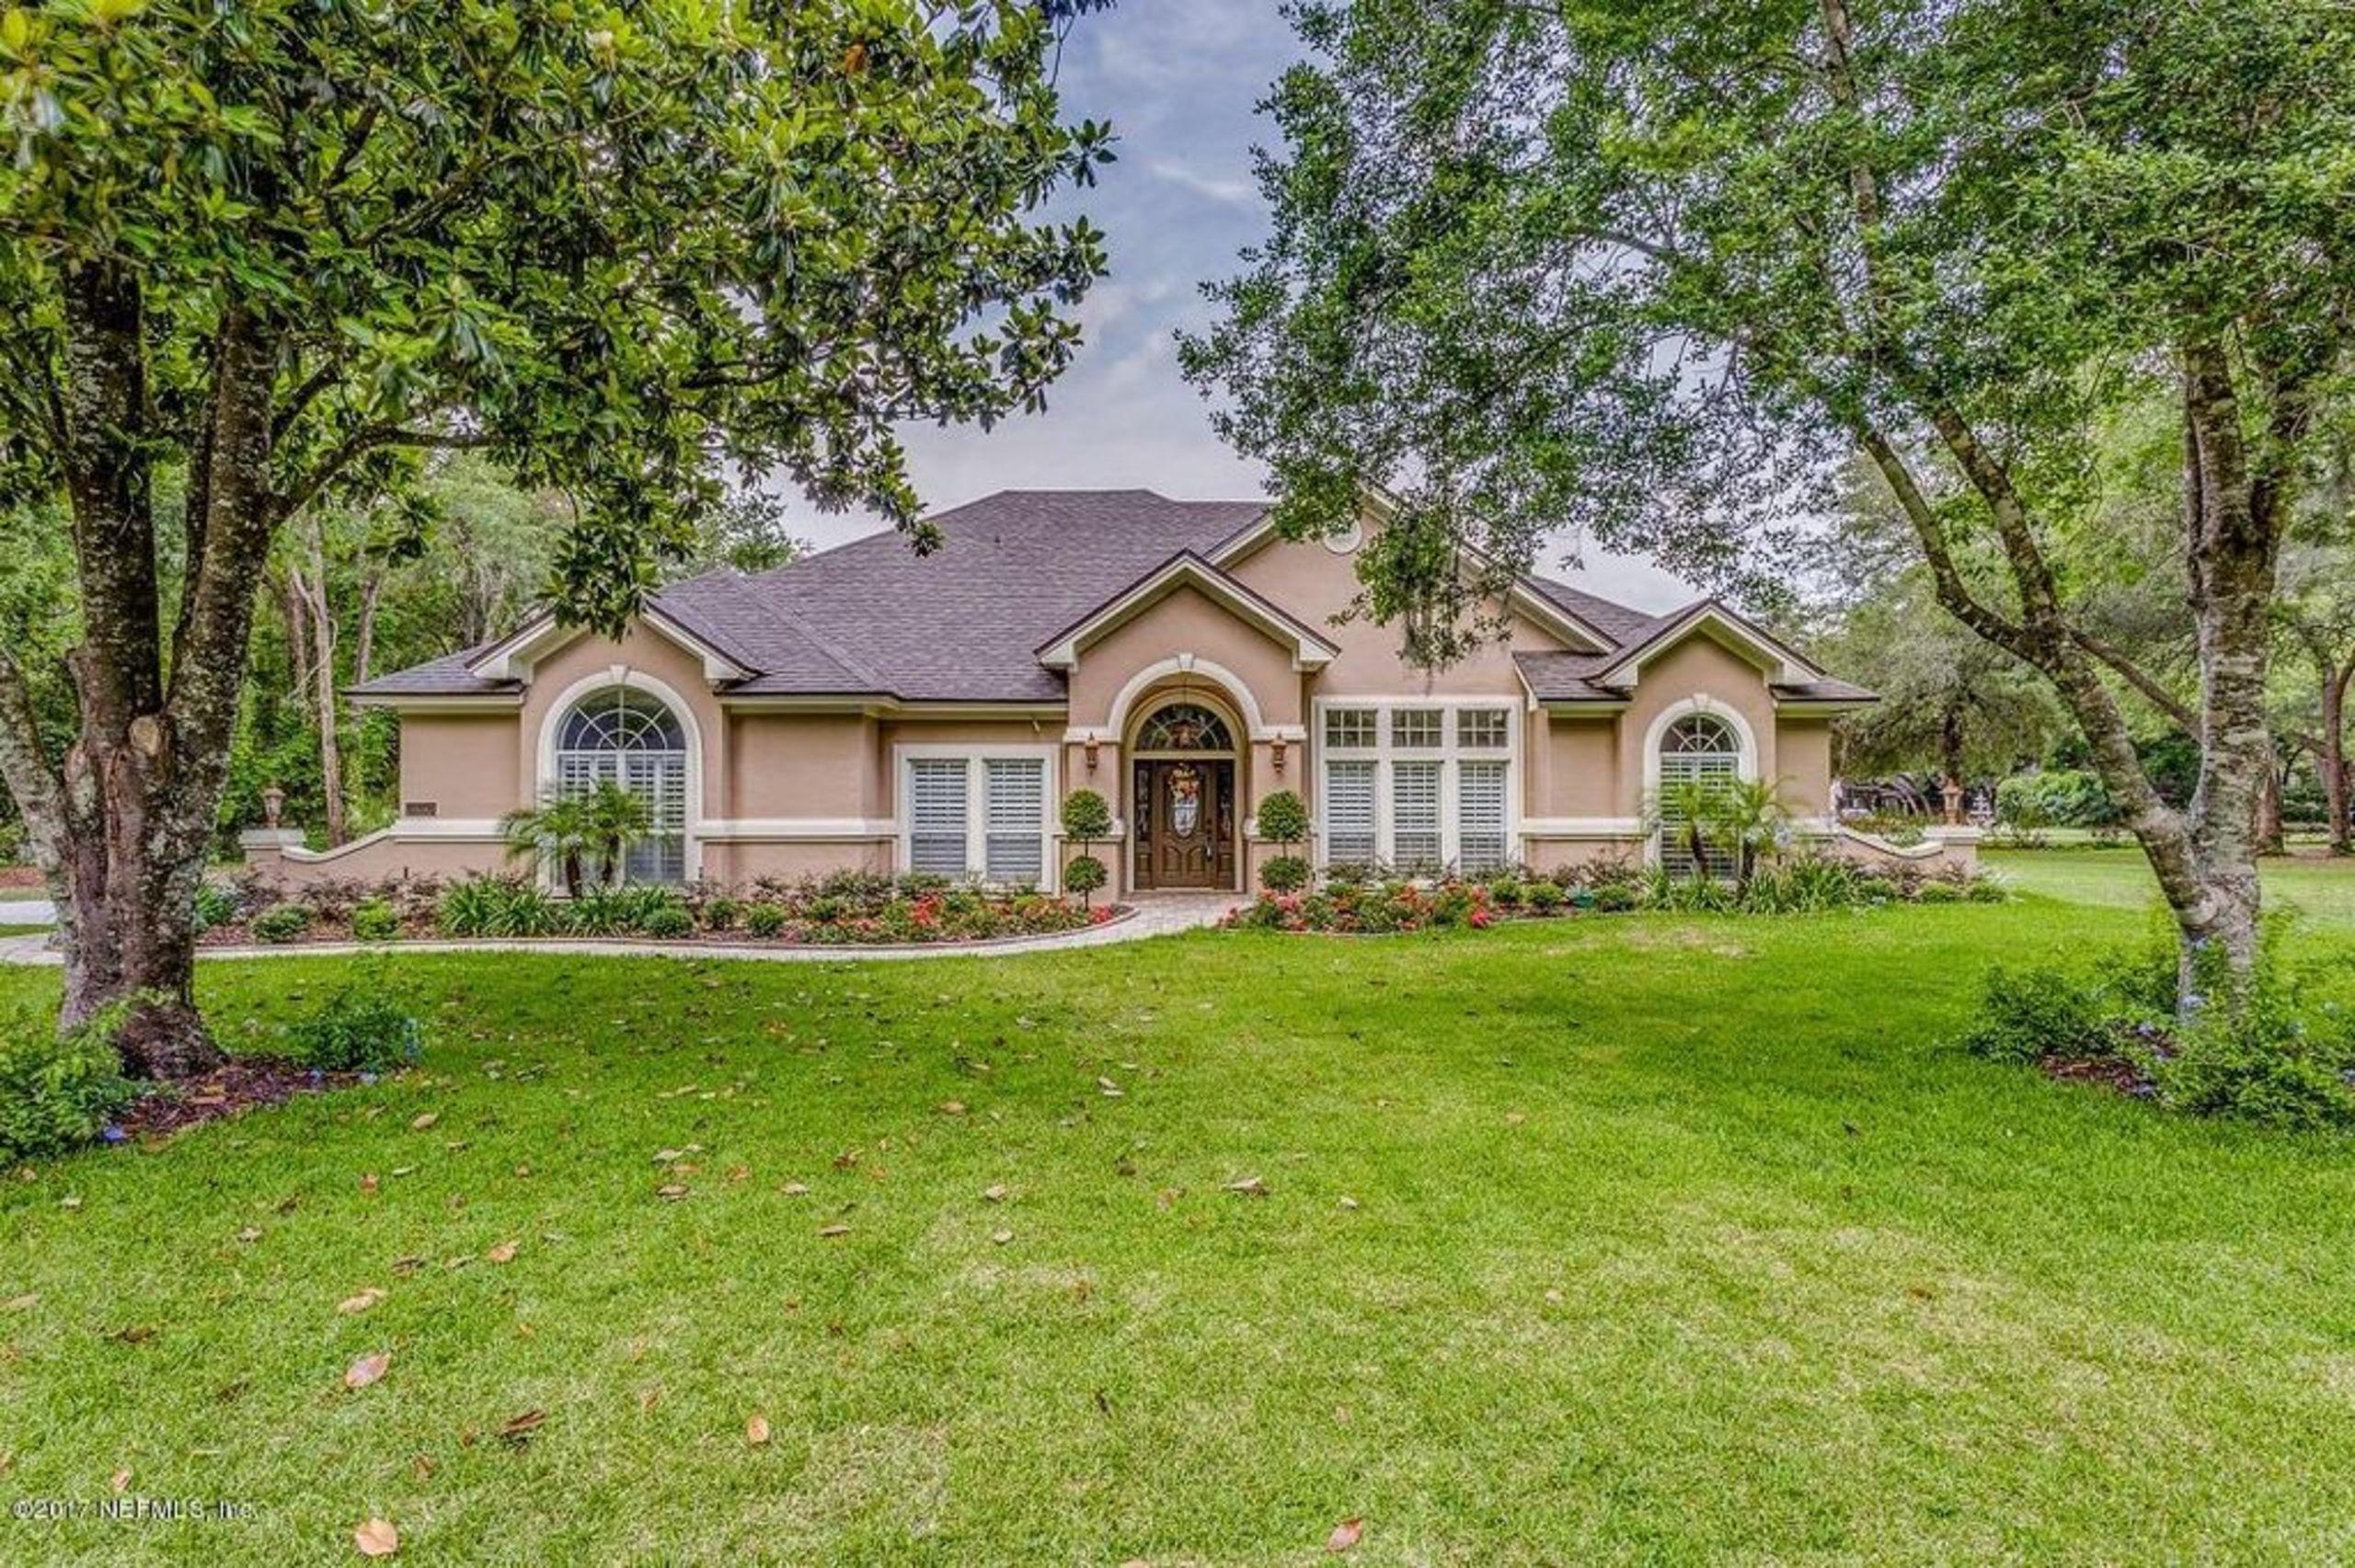 3630 Shinnecock Lane Green Cove Springs, FL 32043